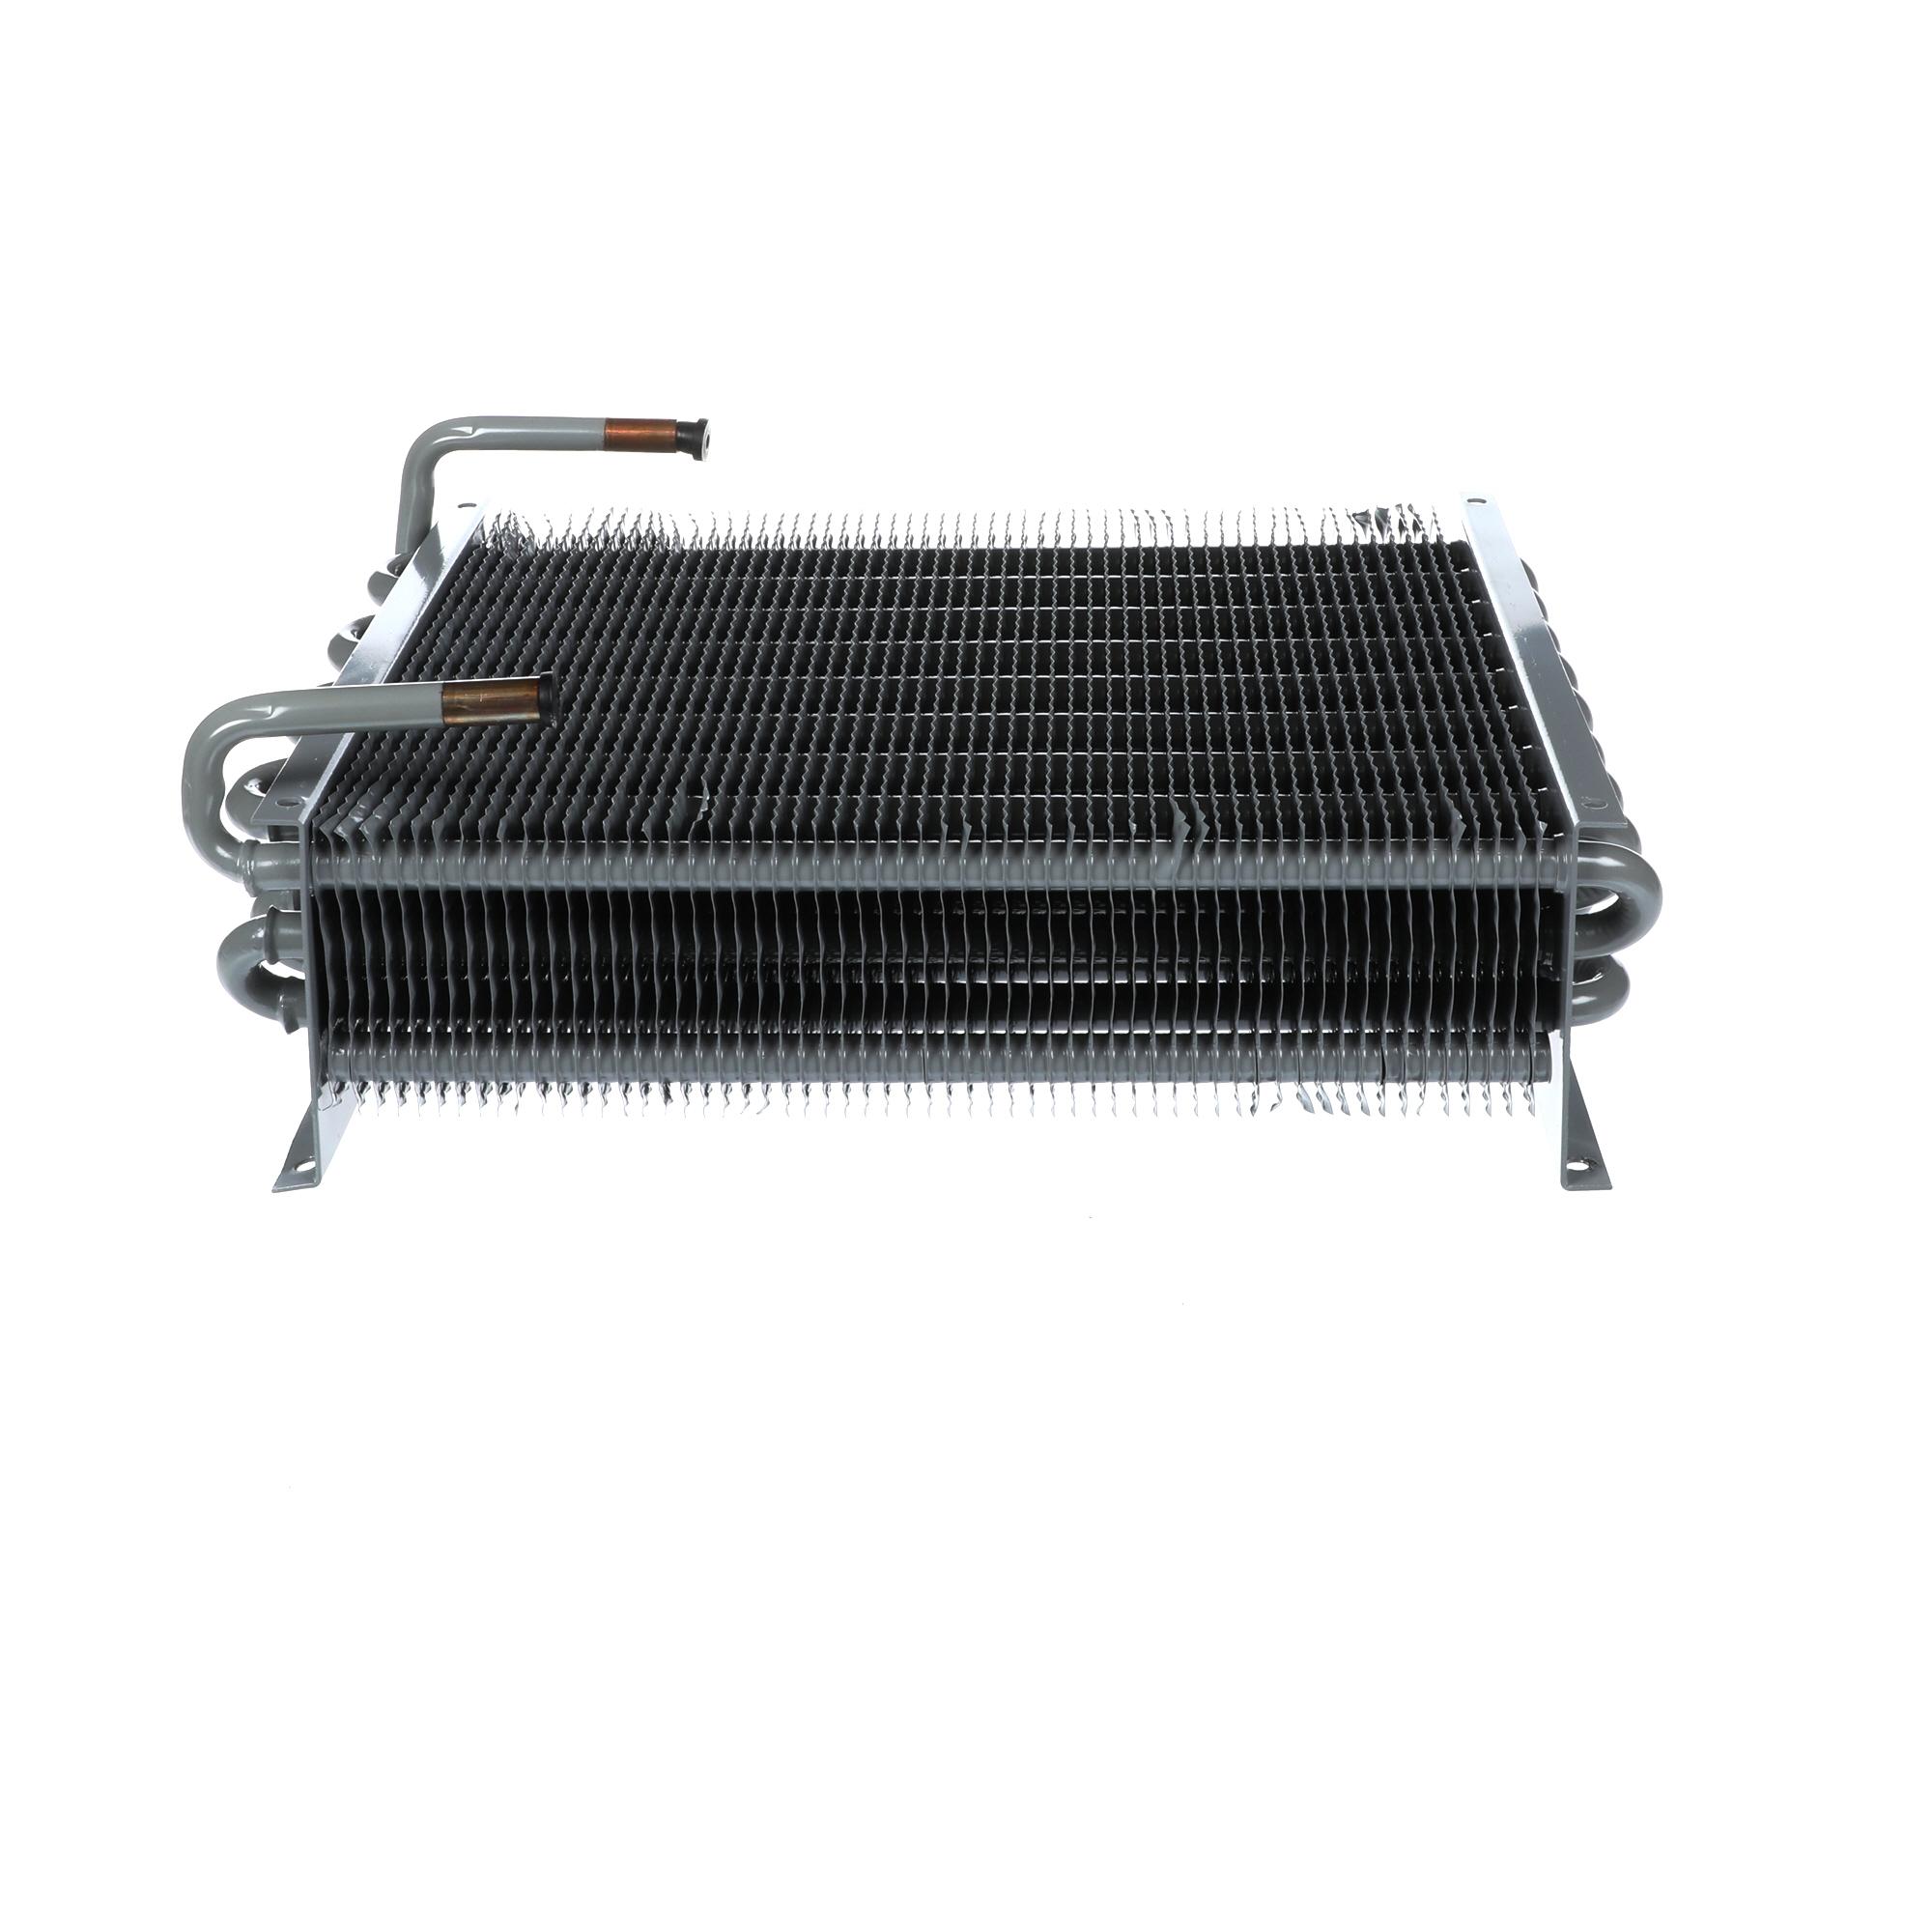 EVAPORATOR 300MM X 230MM X 80(W/O LINES)